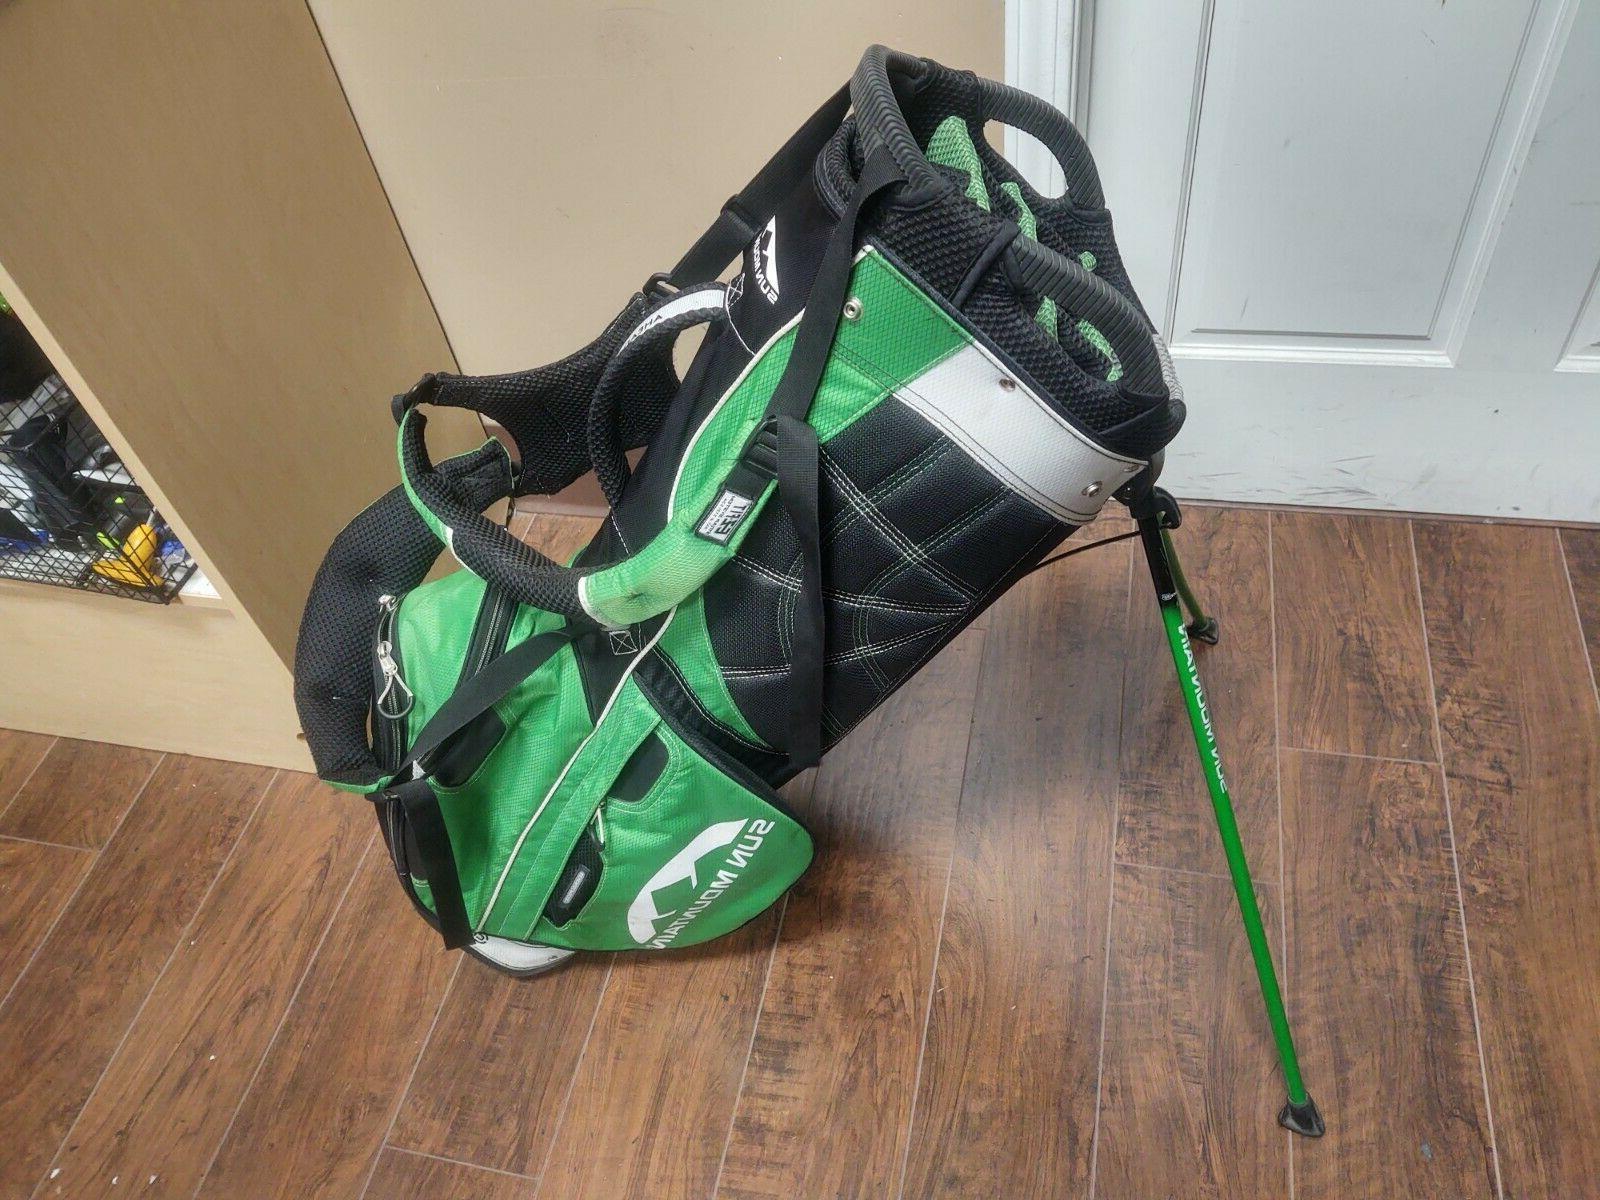 Sun Mountain Four 5 14 Dual Strap Stand Bag Green/Black/White